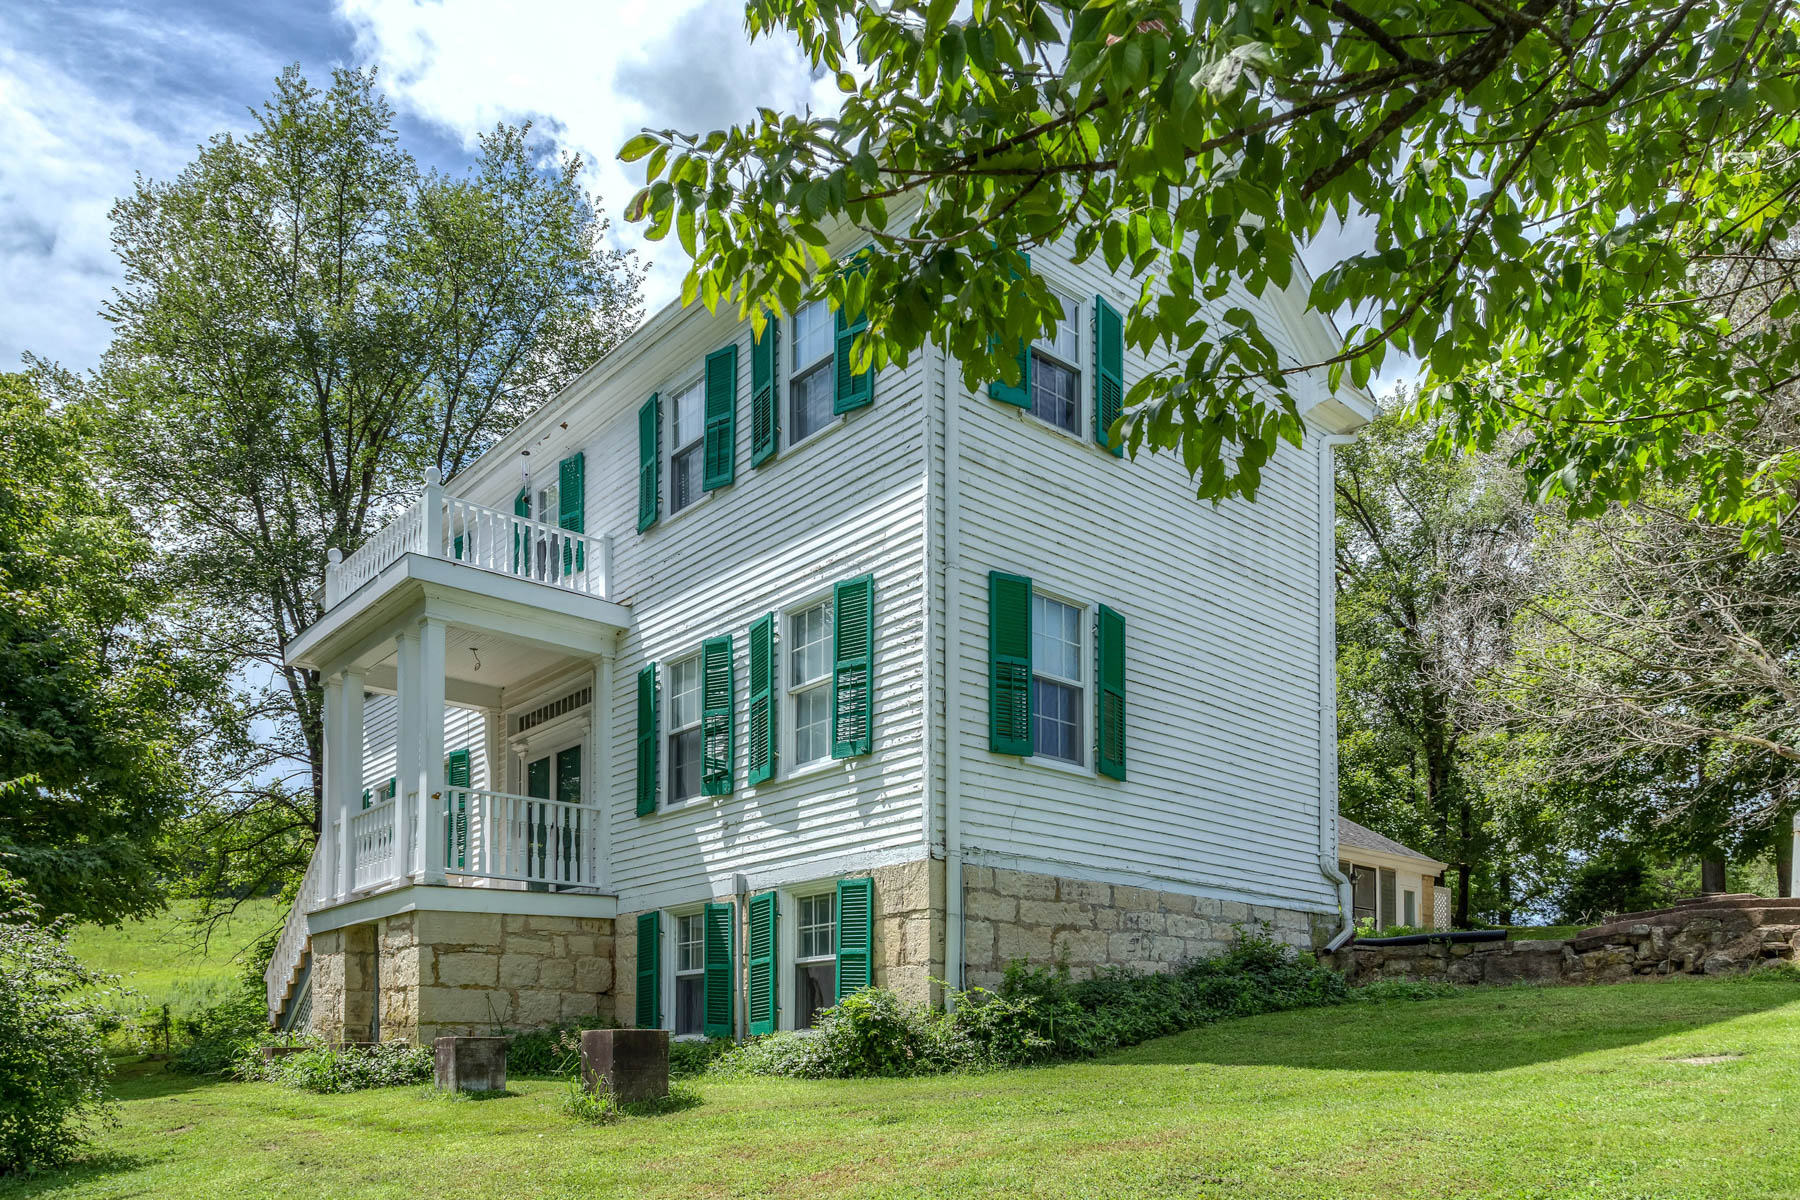 Single Family Home for Sale at Femme Osage Creek 1349 Femme Osage Creek Road Augusta, Missouri, 63332 United States